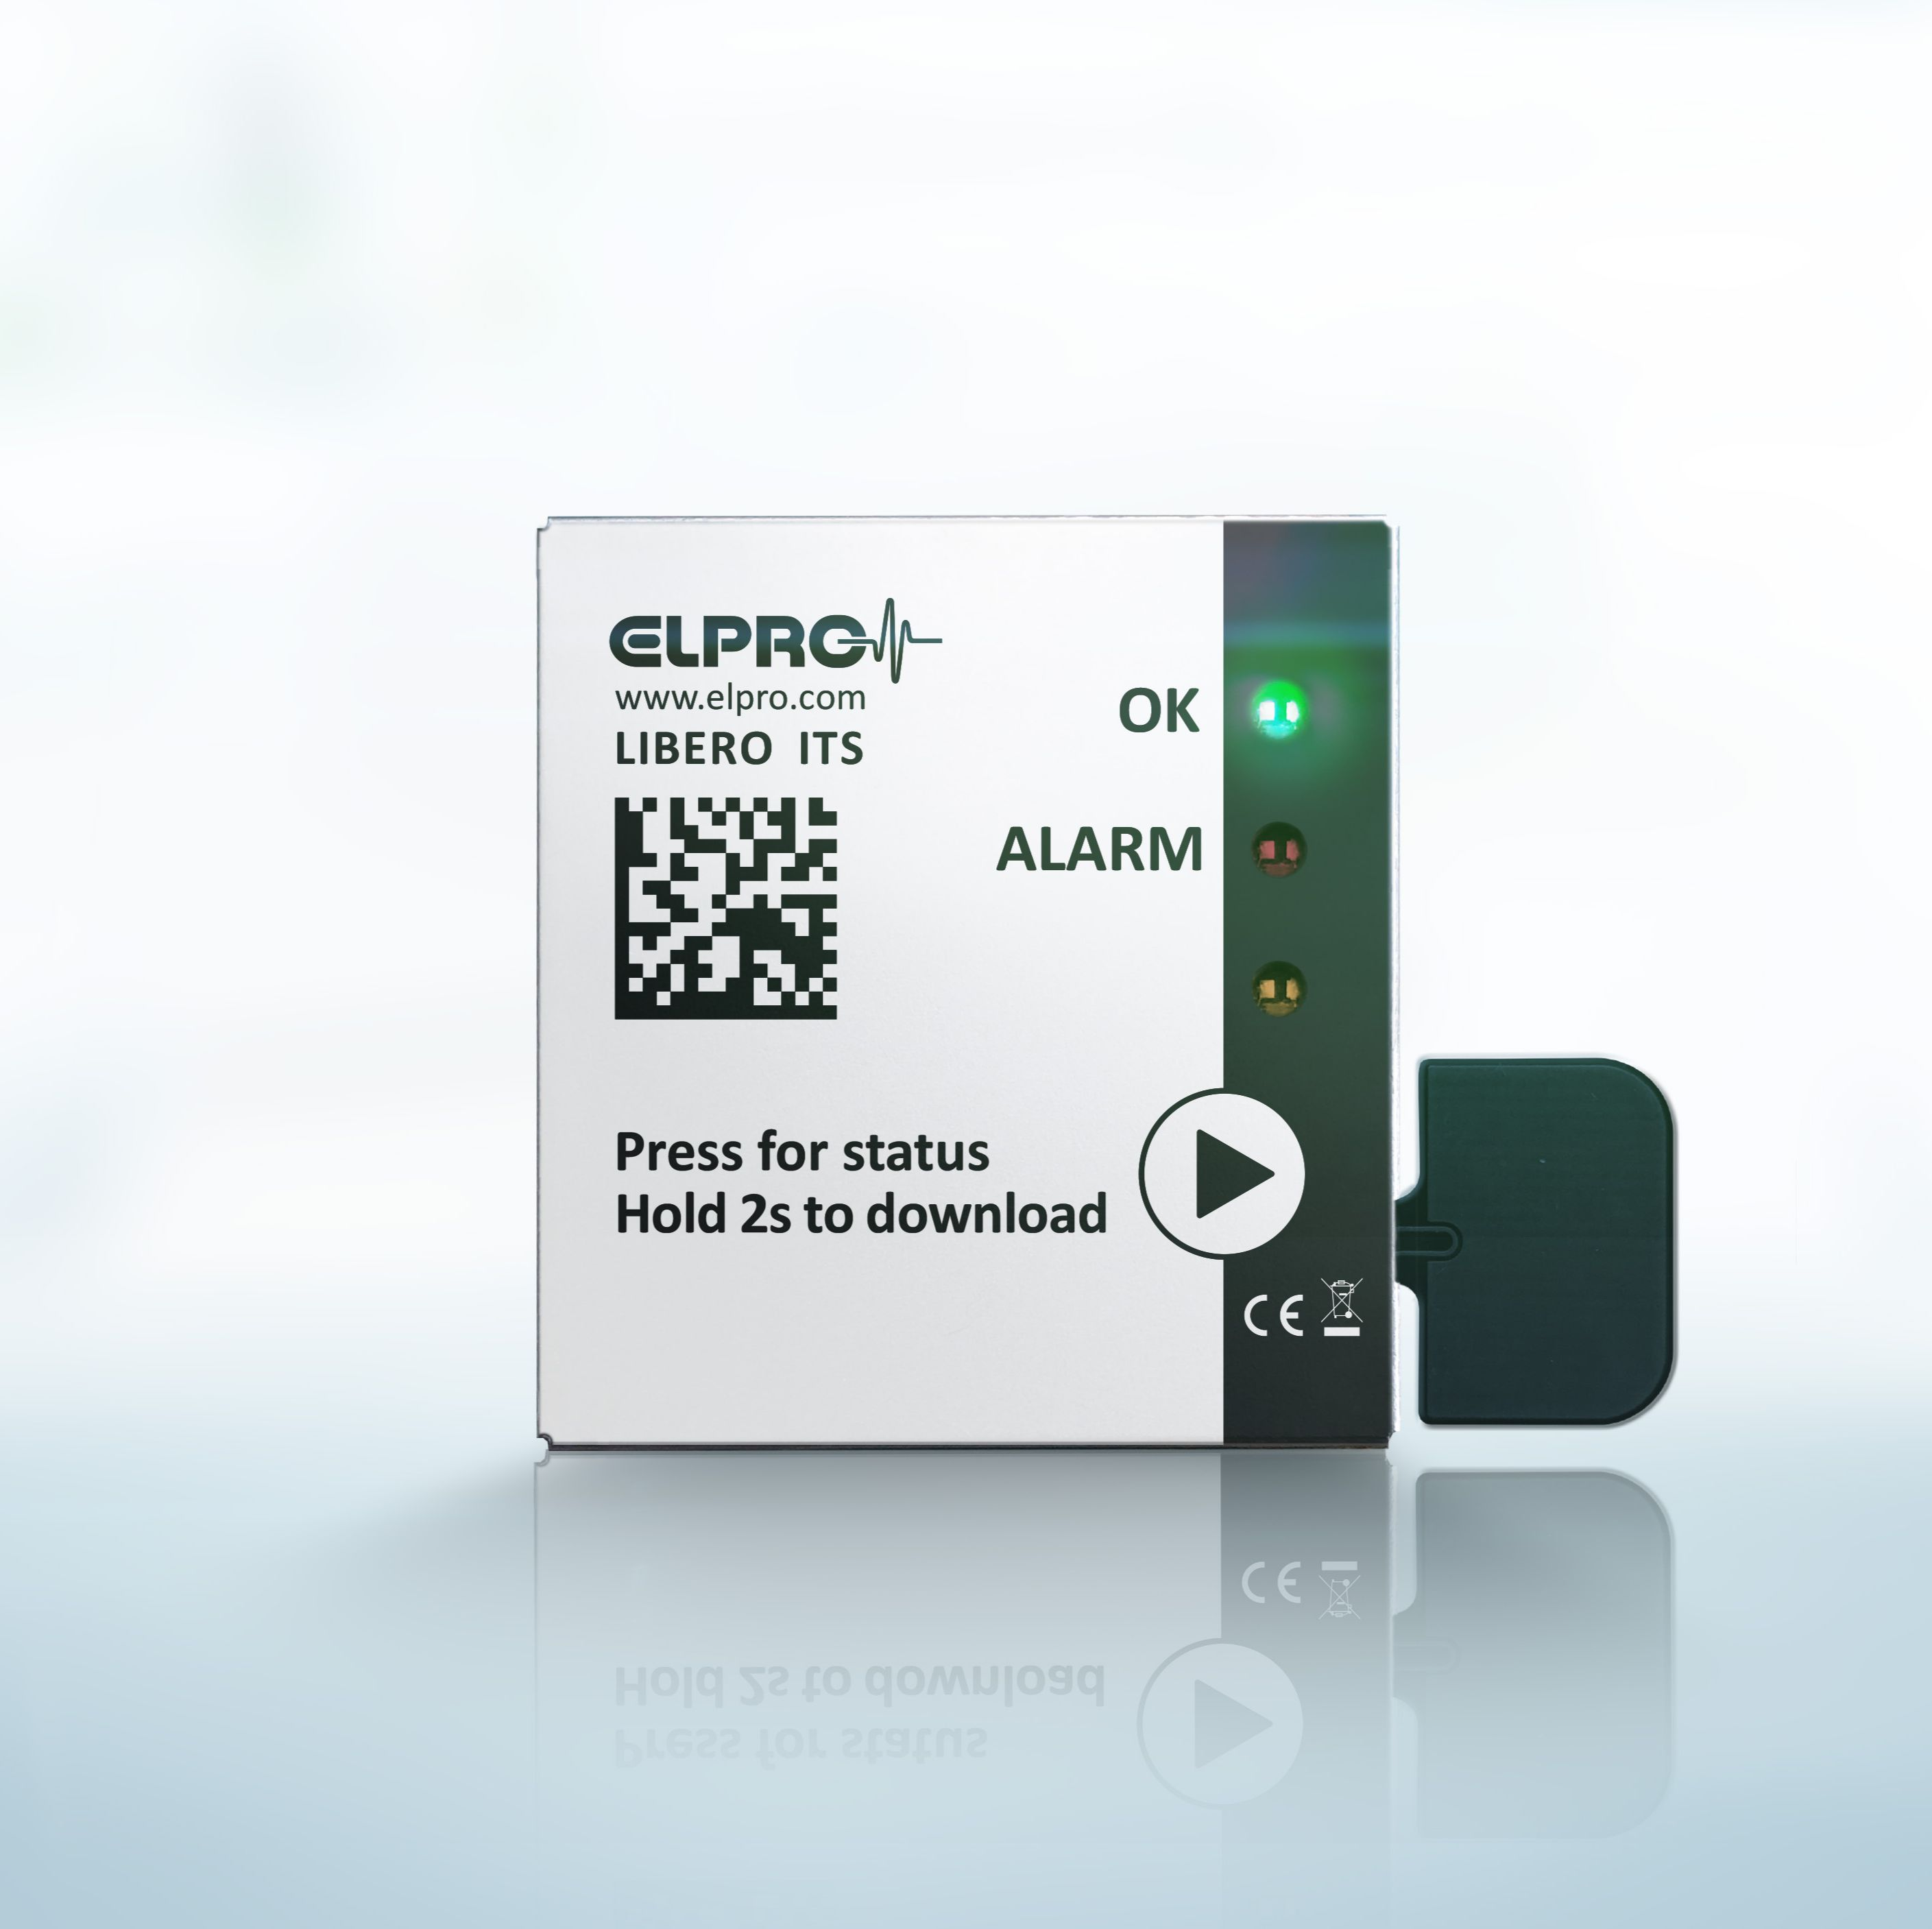 瑞士ELPRO创新多级温度指示器LIBERO ITS